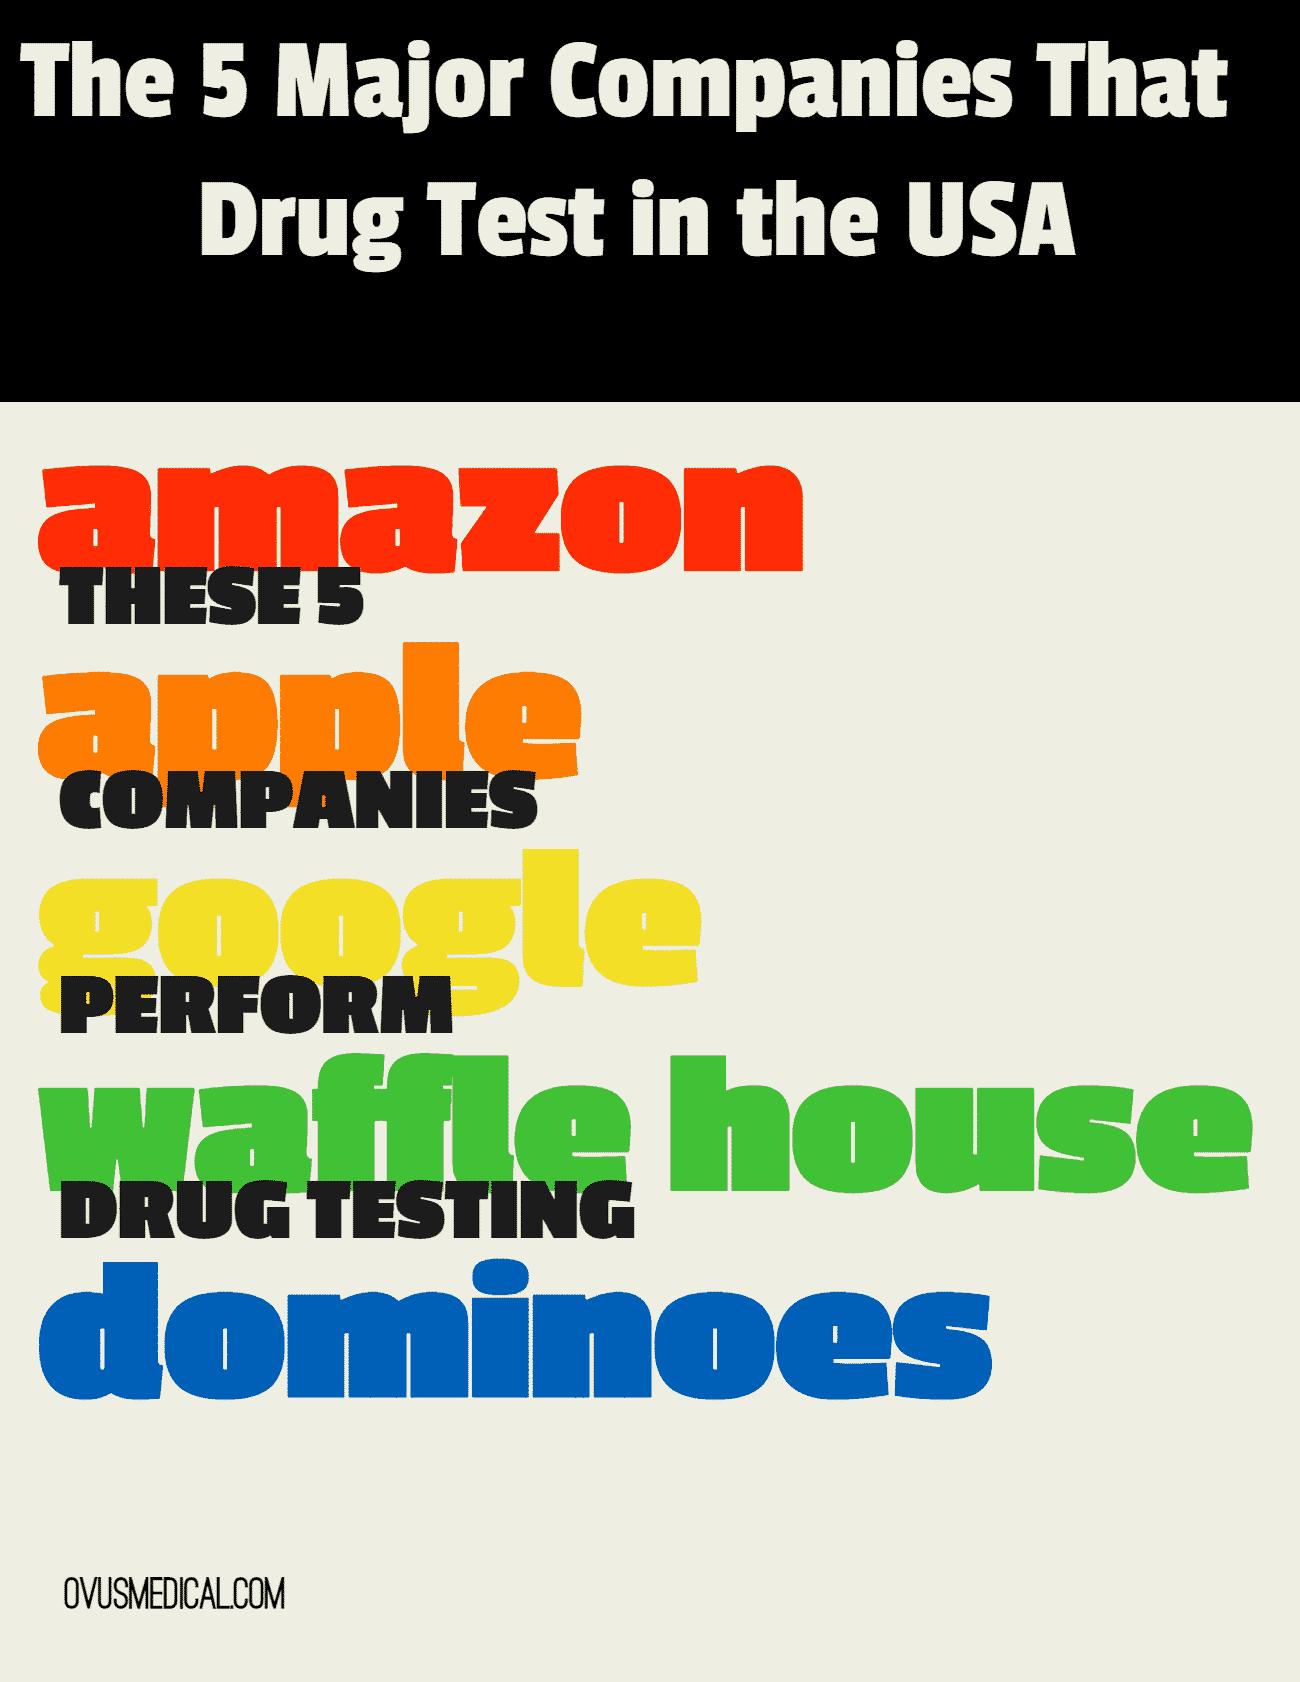 5 companies that drug test.